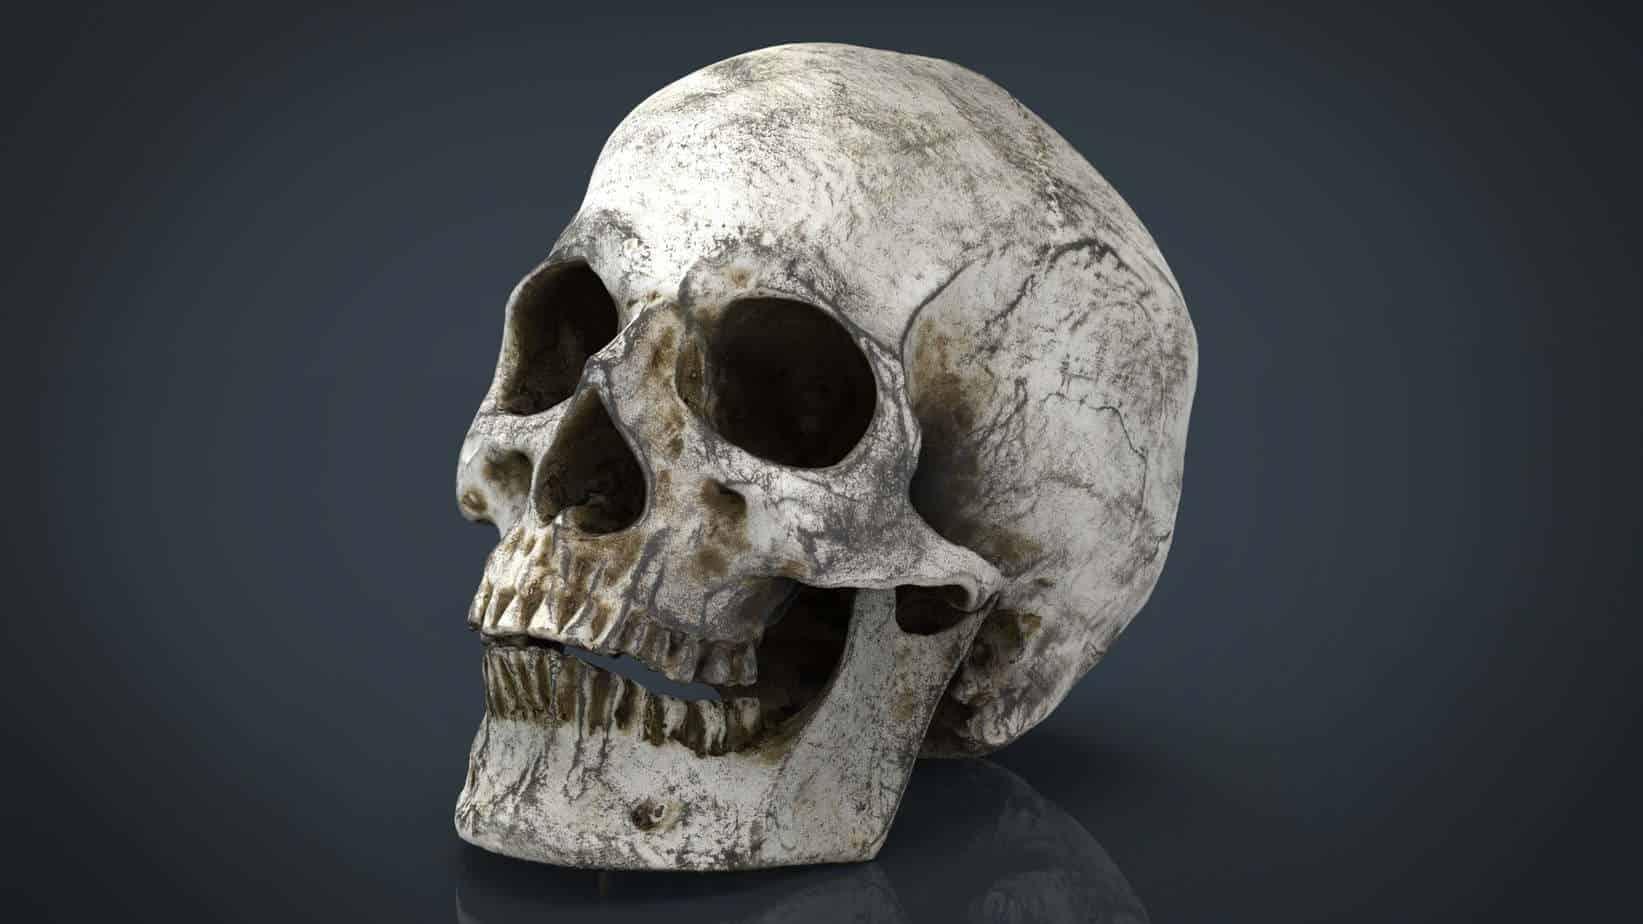 Police Arrest Man In Possession Of Human Skull In Abuja ...